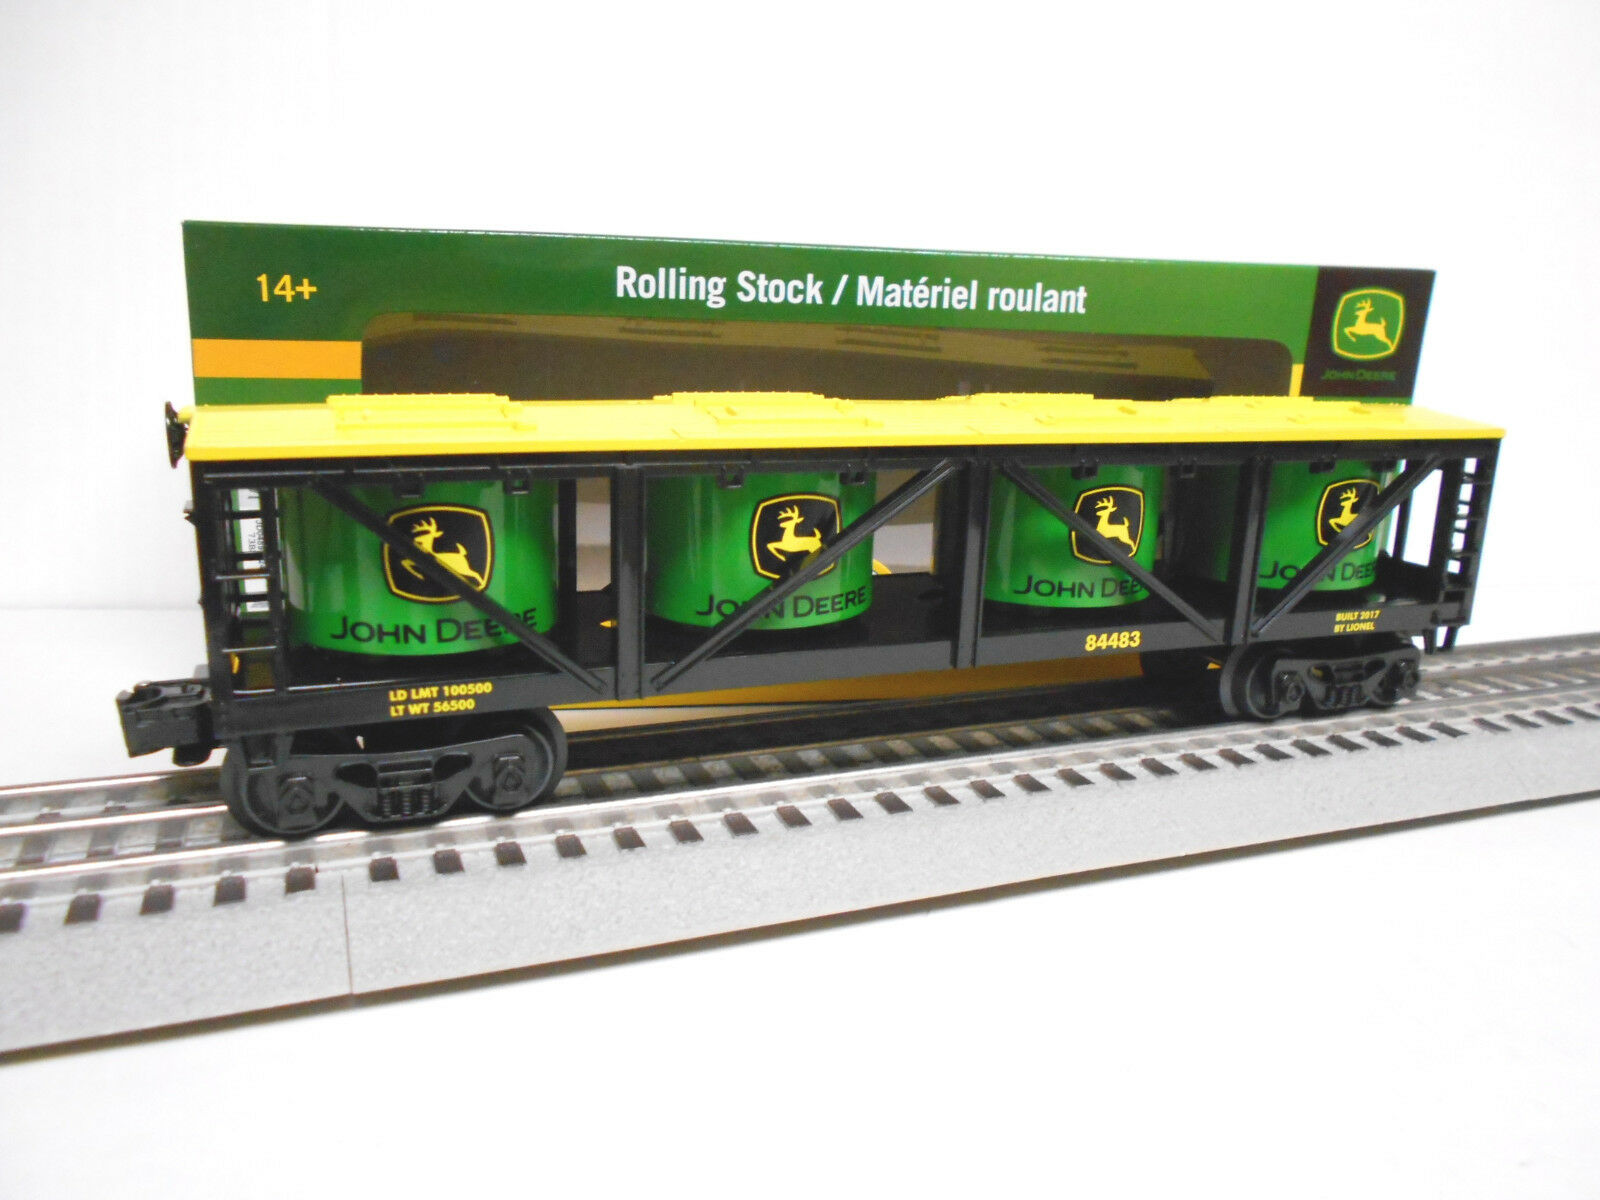 Lionel 6-84483 John Deere grano IVA coche o calibre Tren Tanque de tractor de granja molino nuevo